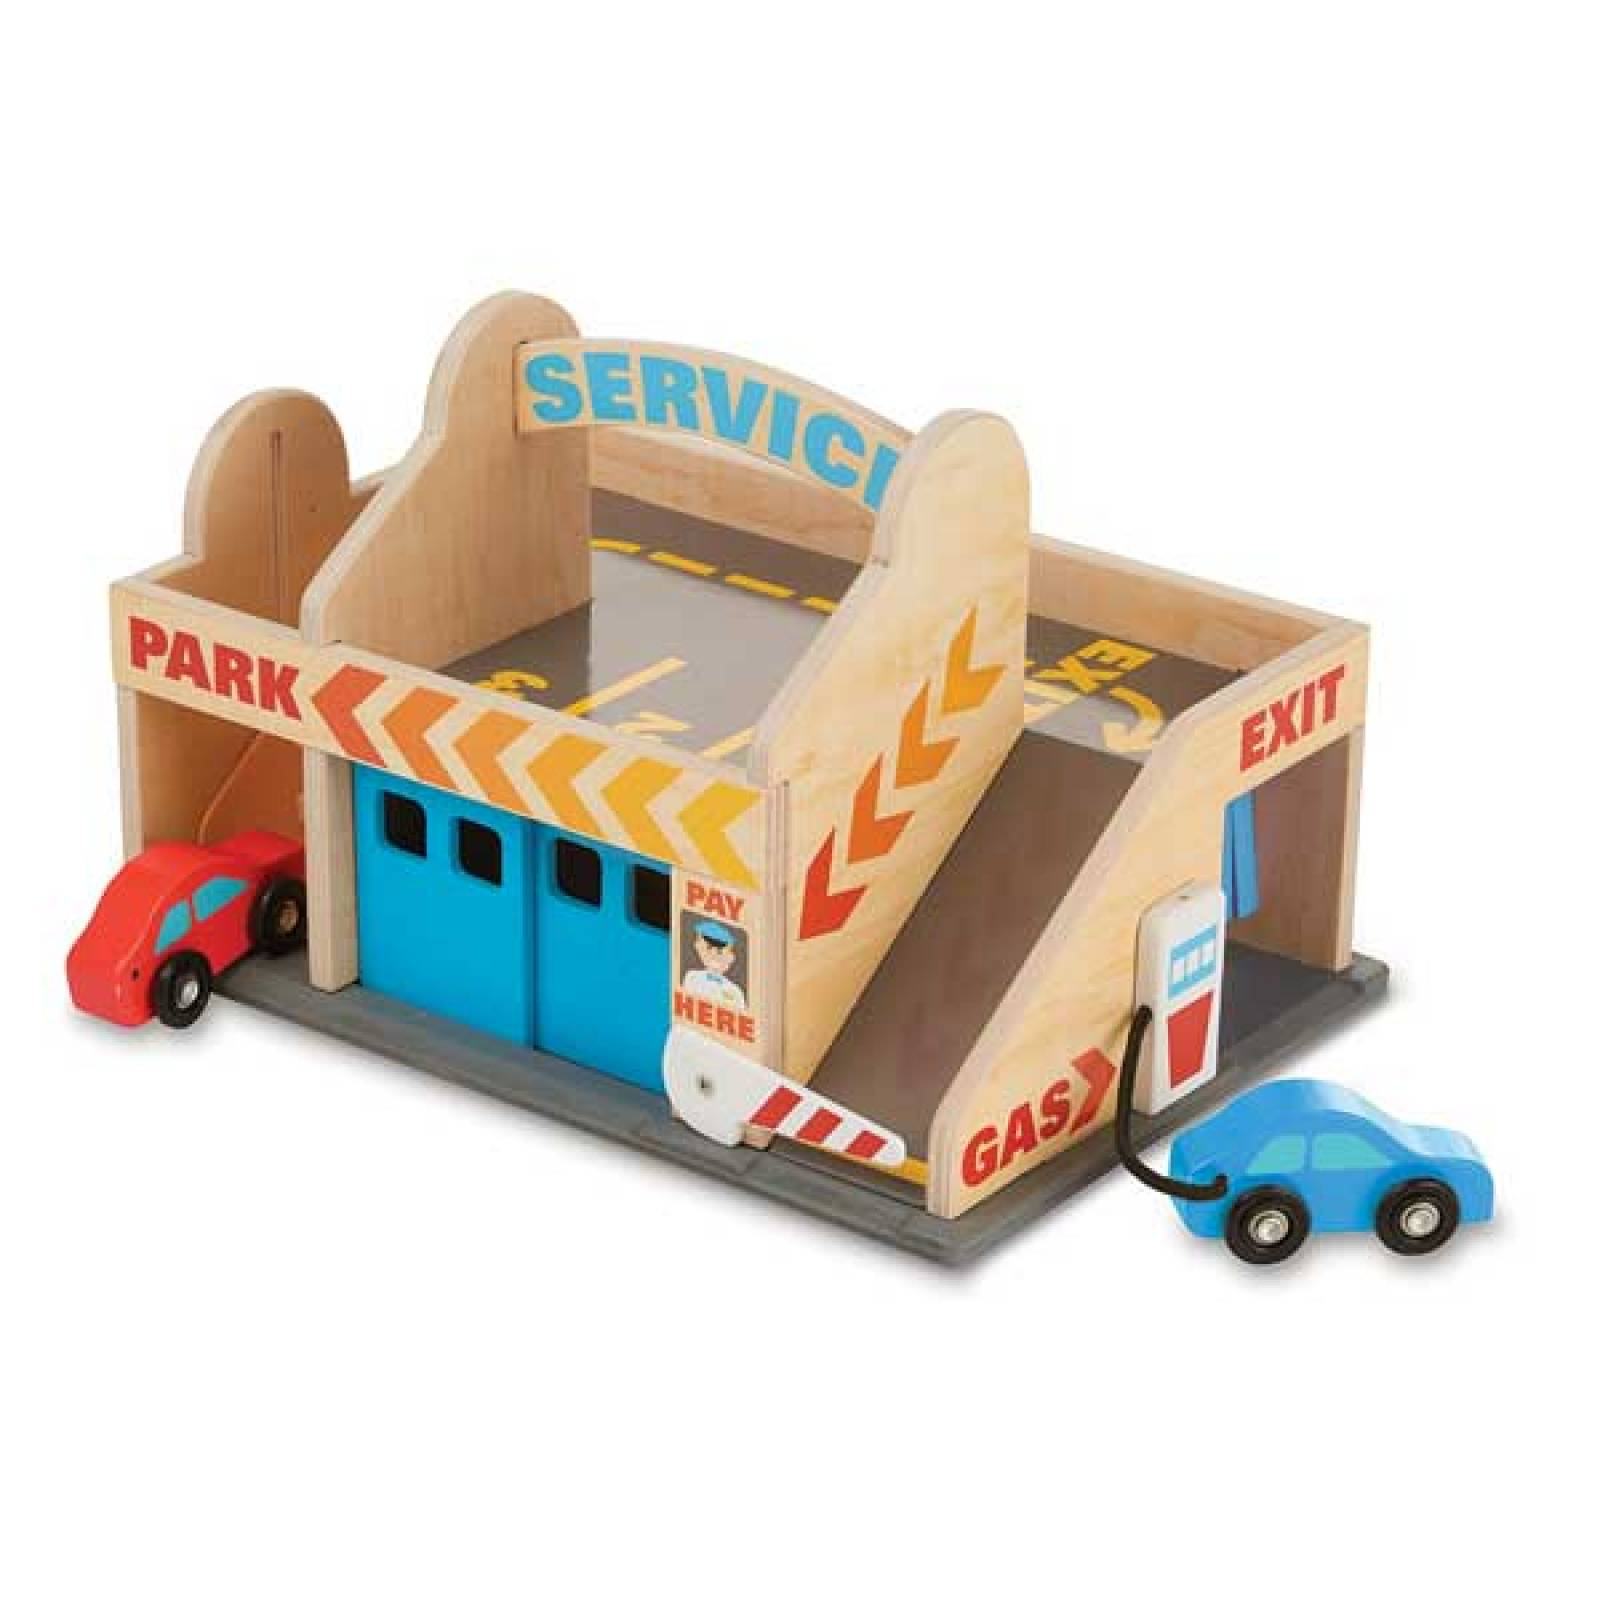 Service Station Parking Garage Toy 3+